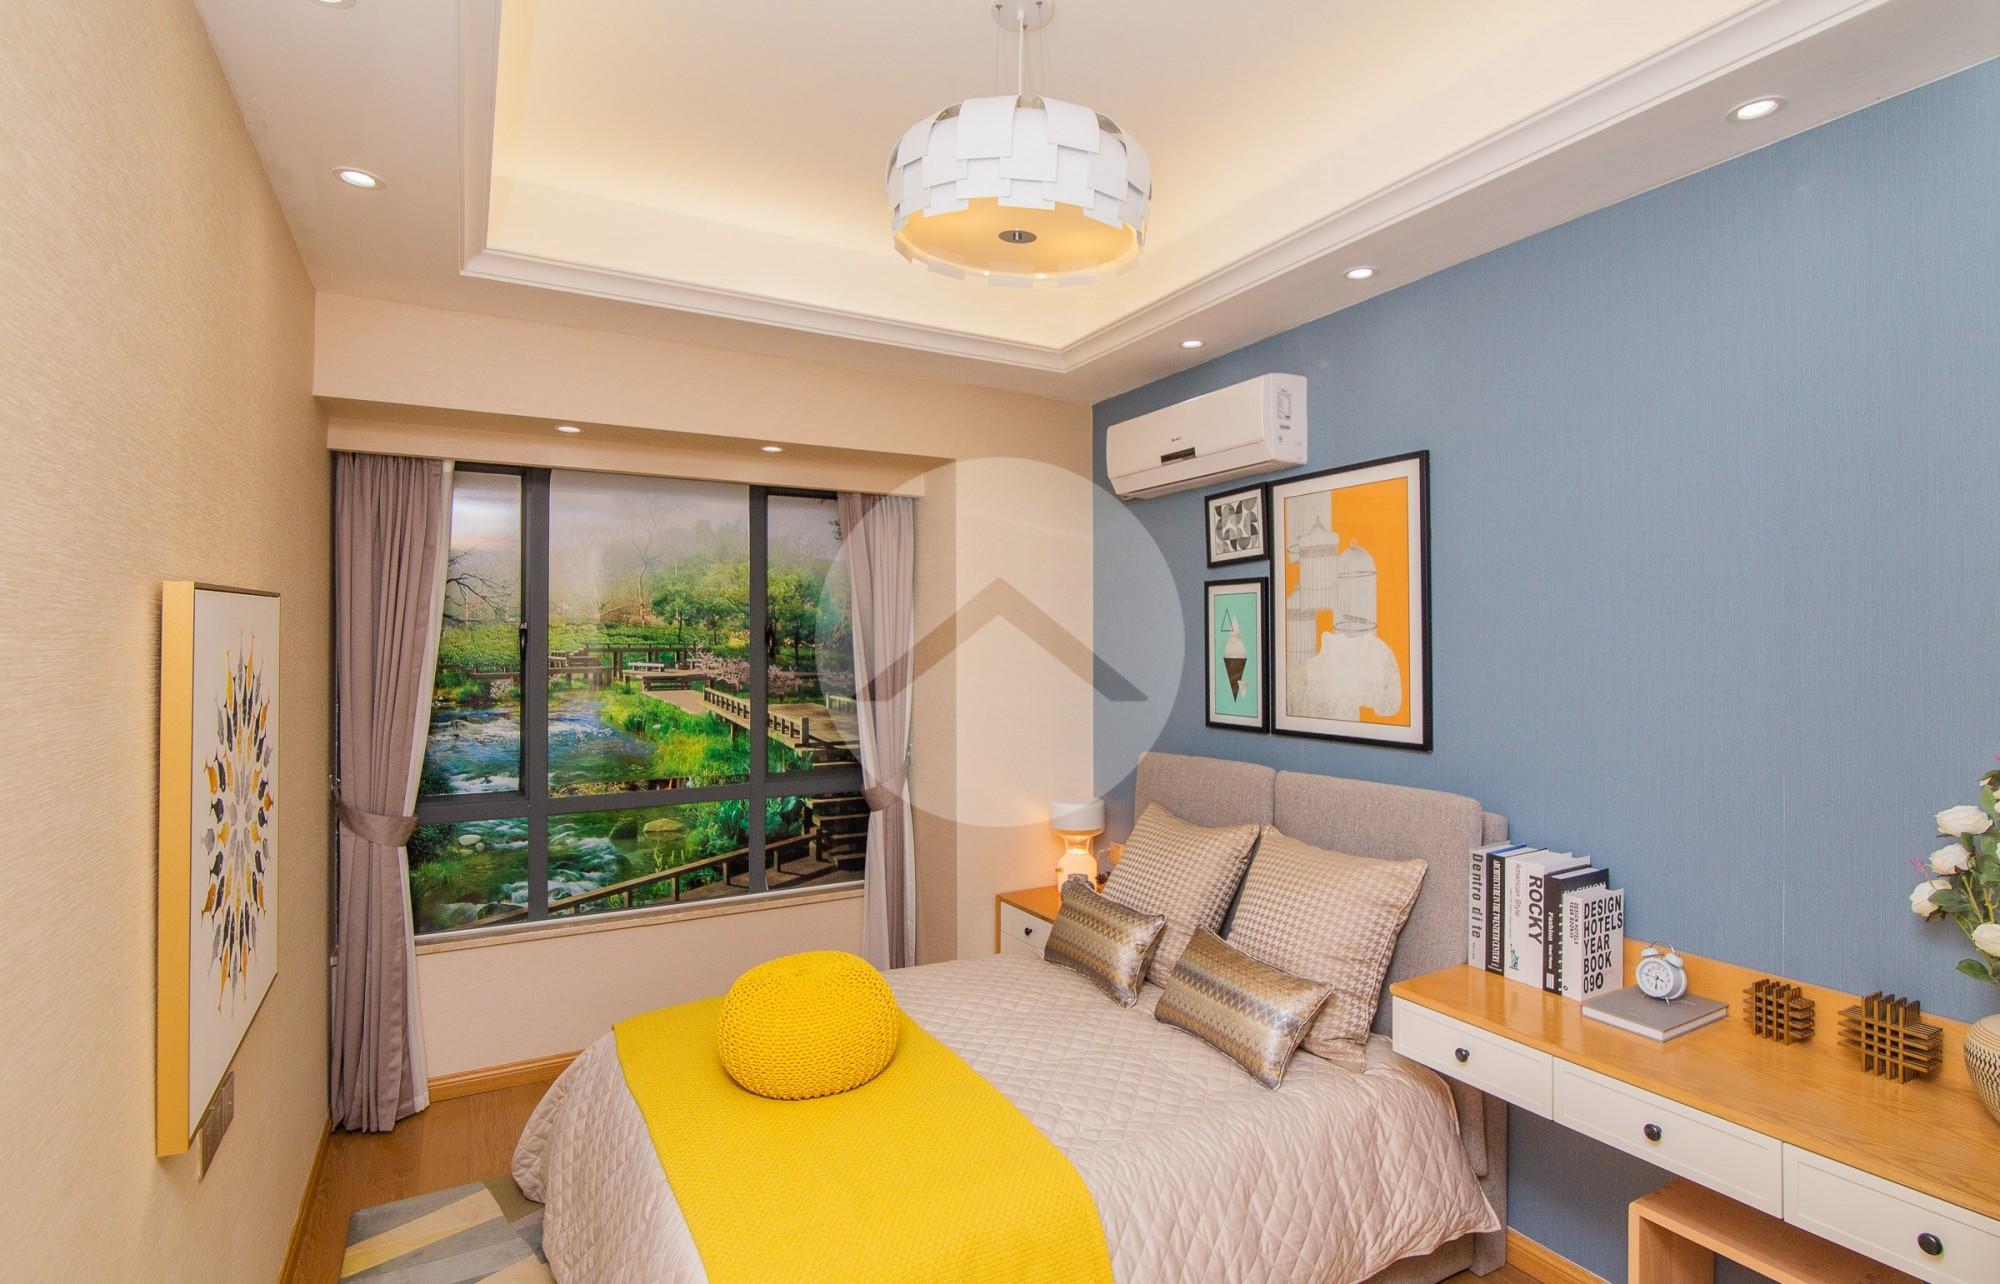 1 Bedroom Condominium For Sale - Hun Sen Blvd, Phnom Penh